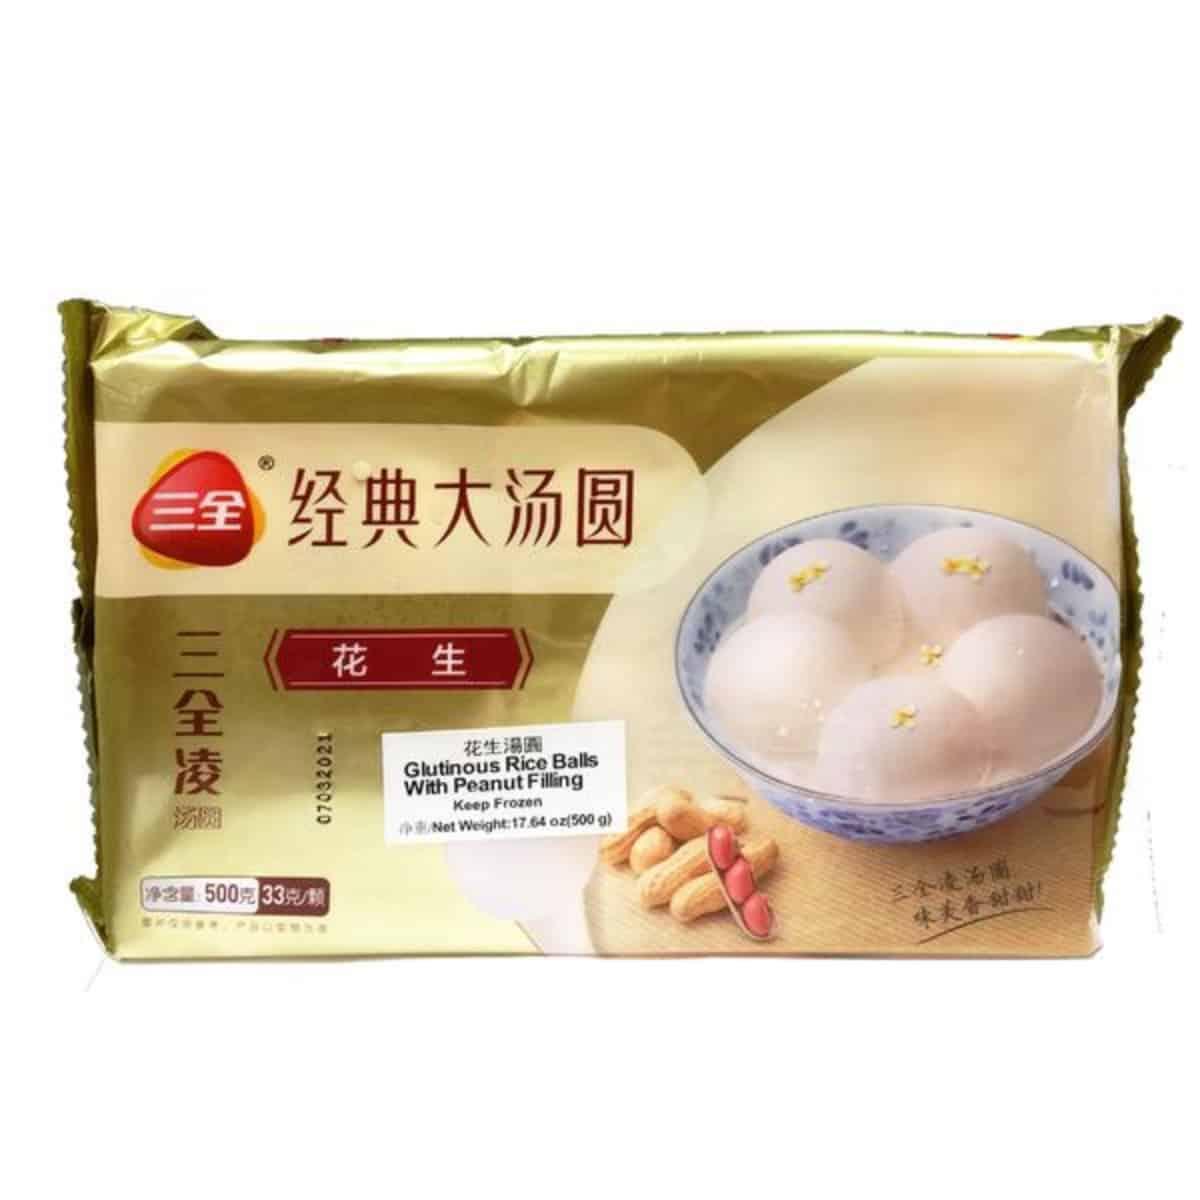 SQ Glutinous Peanut Rice Ball 三全精选花生大汤圆..